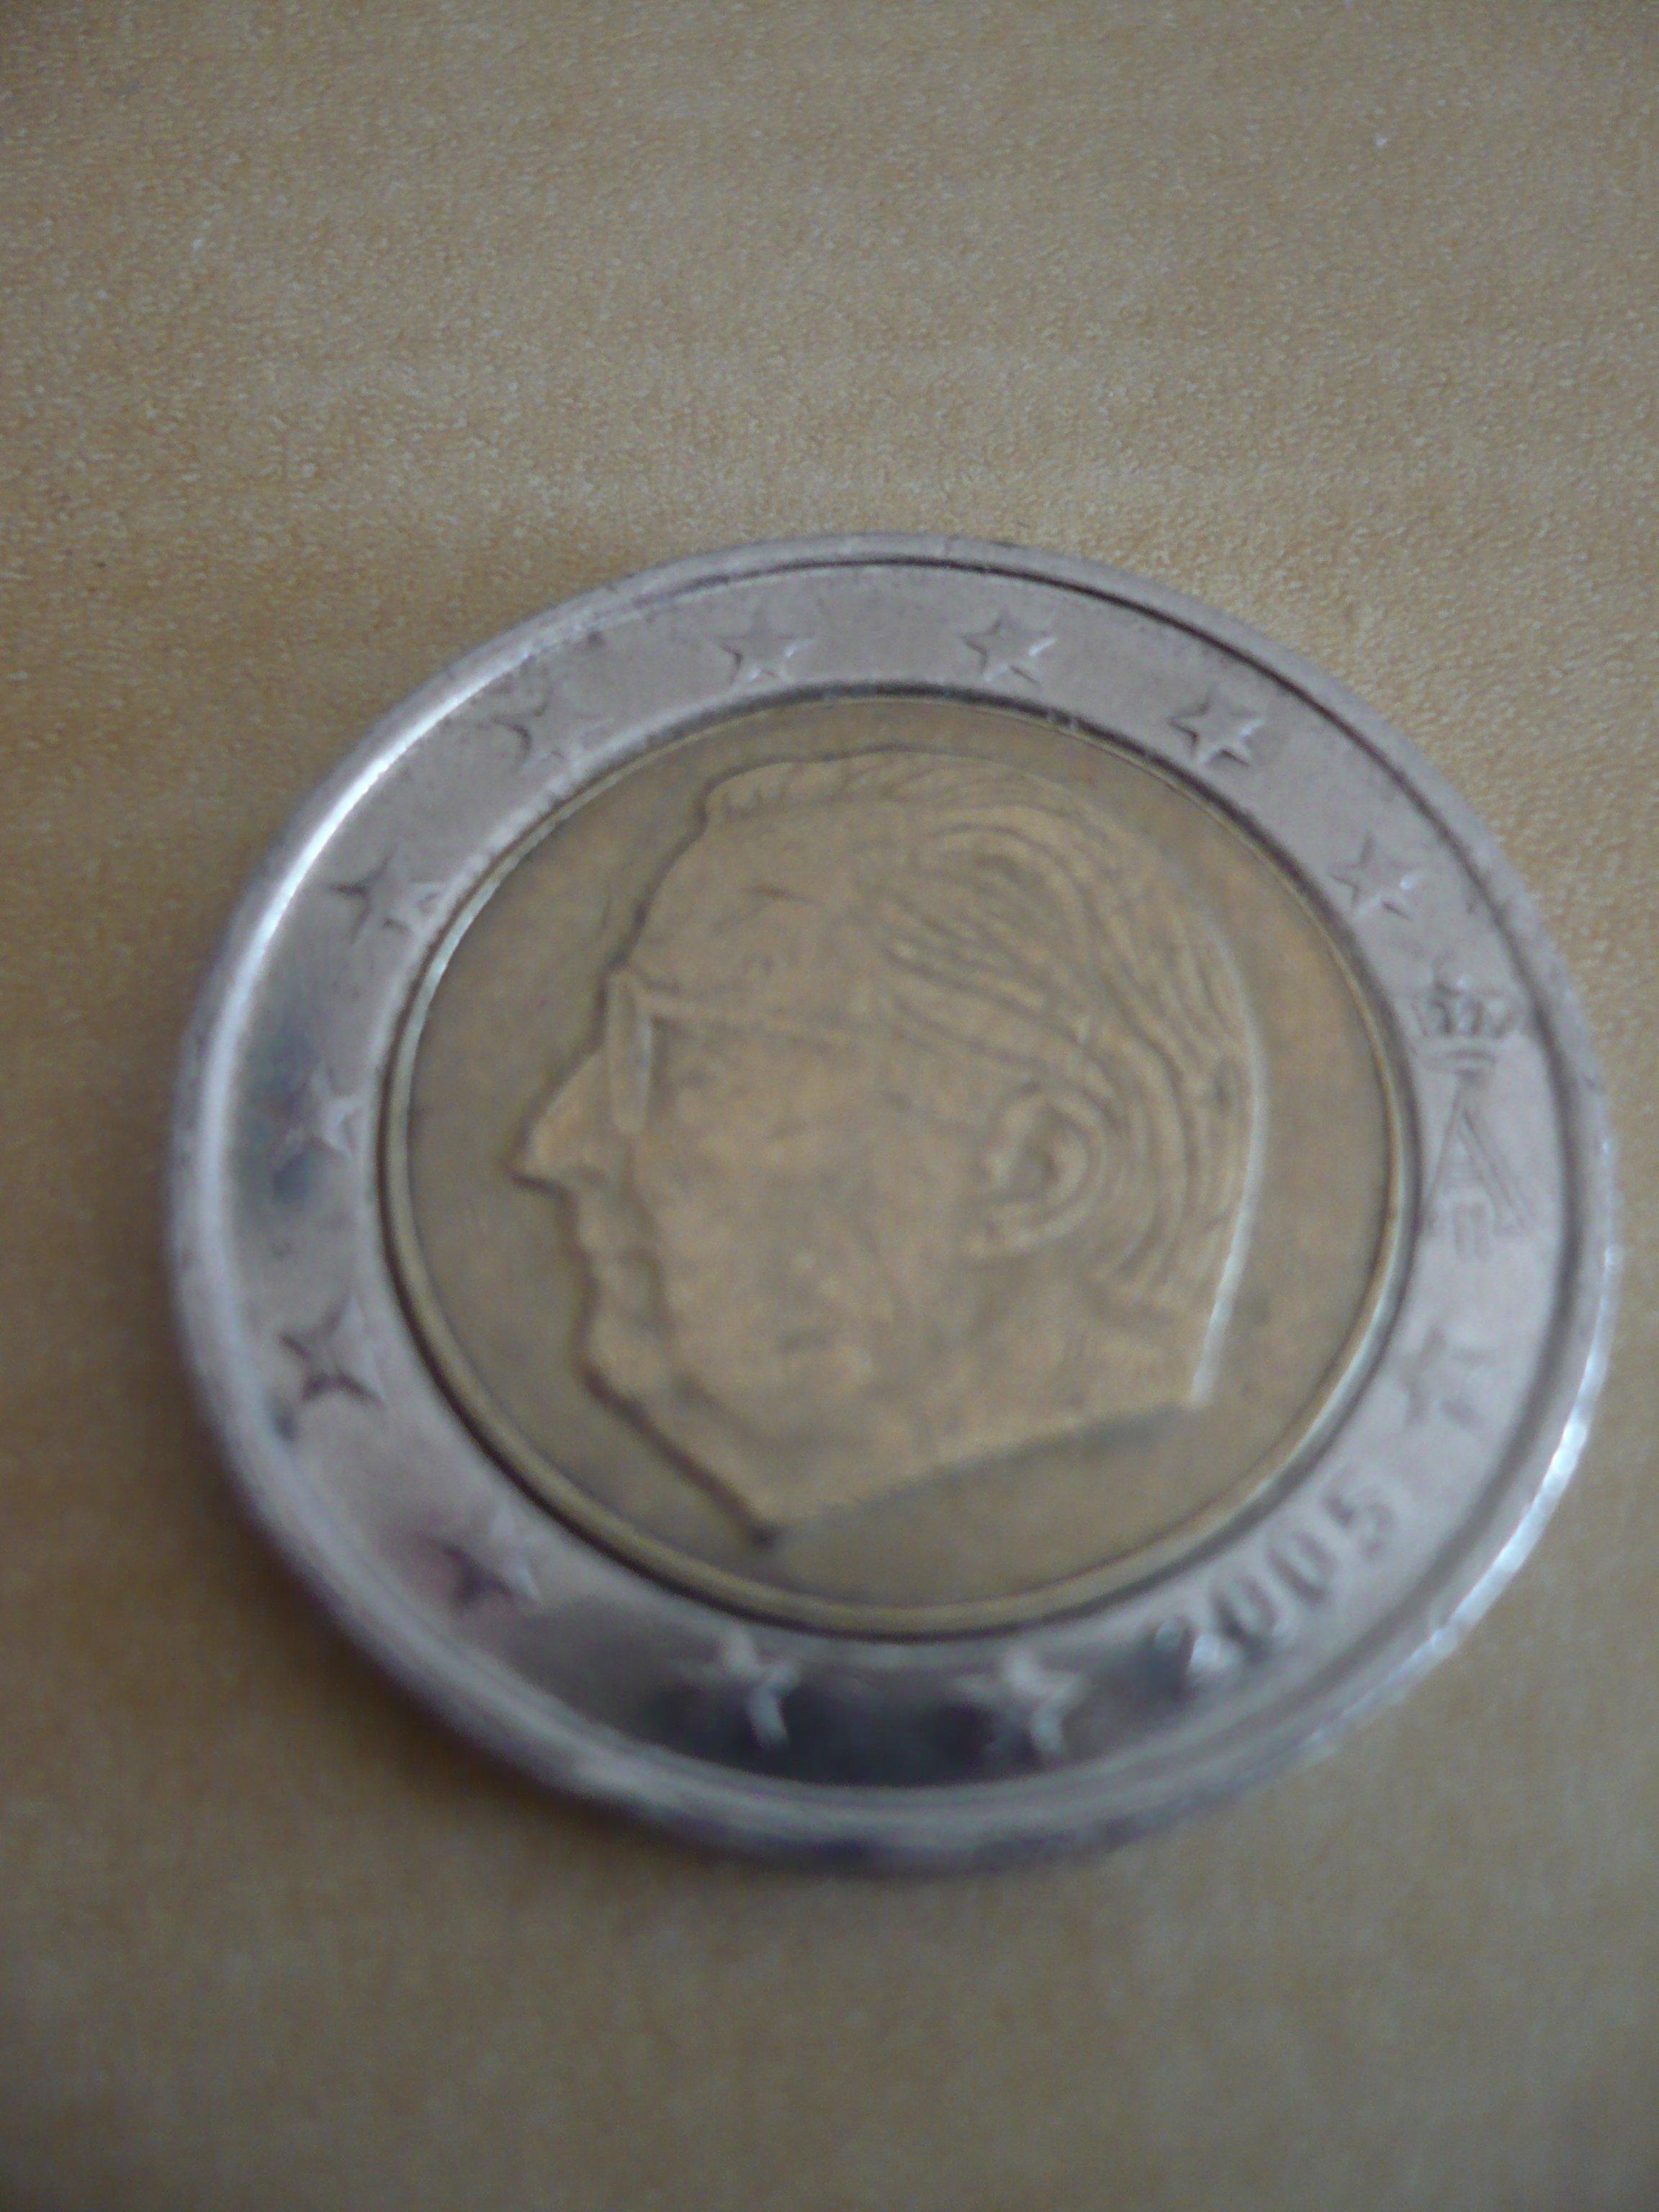 Belgische 2 Euro Münze Fehlprägung Fälschung Normal